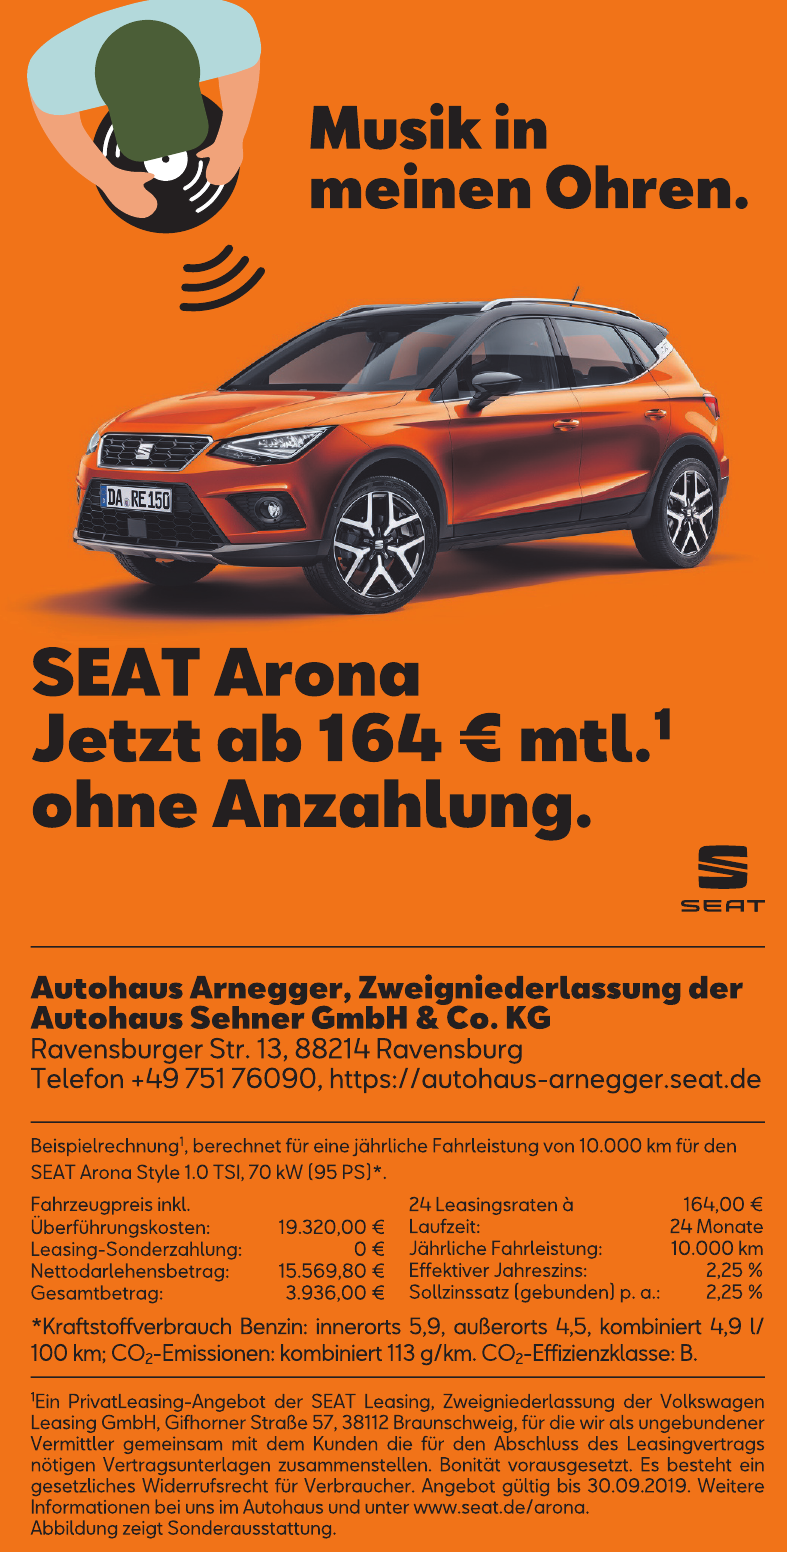 Autohaus Arnegger